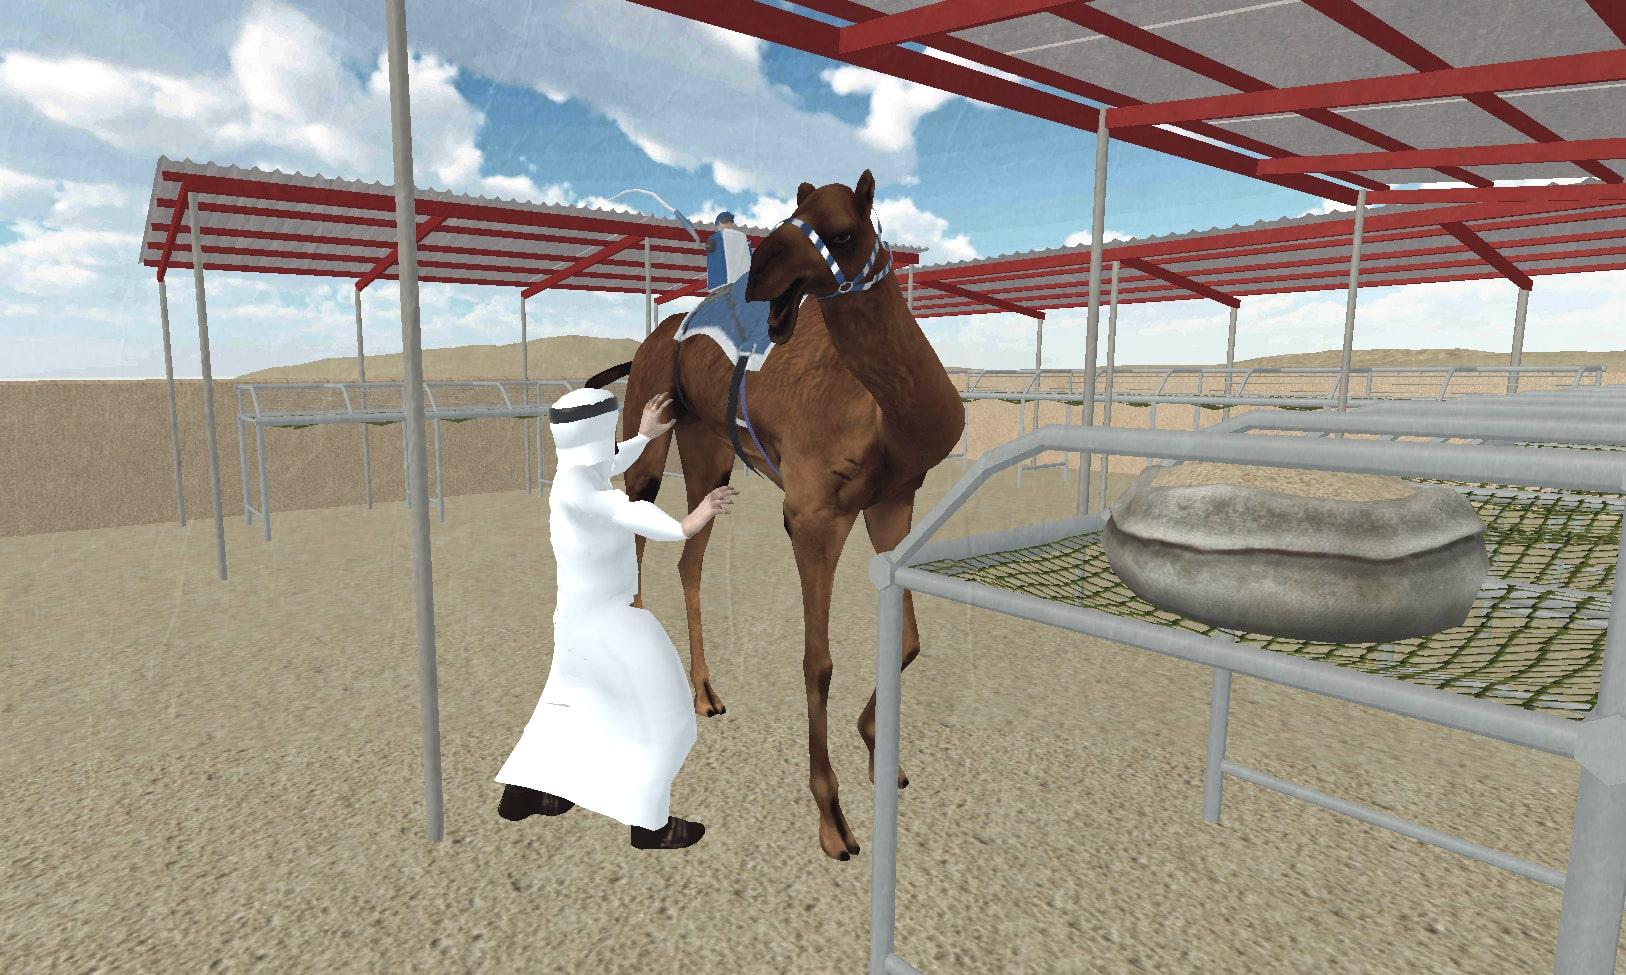 Camel Charachter